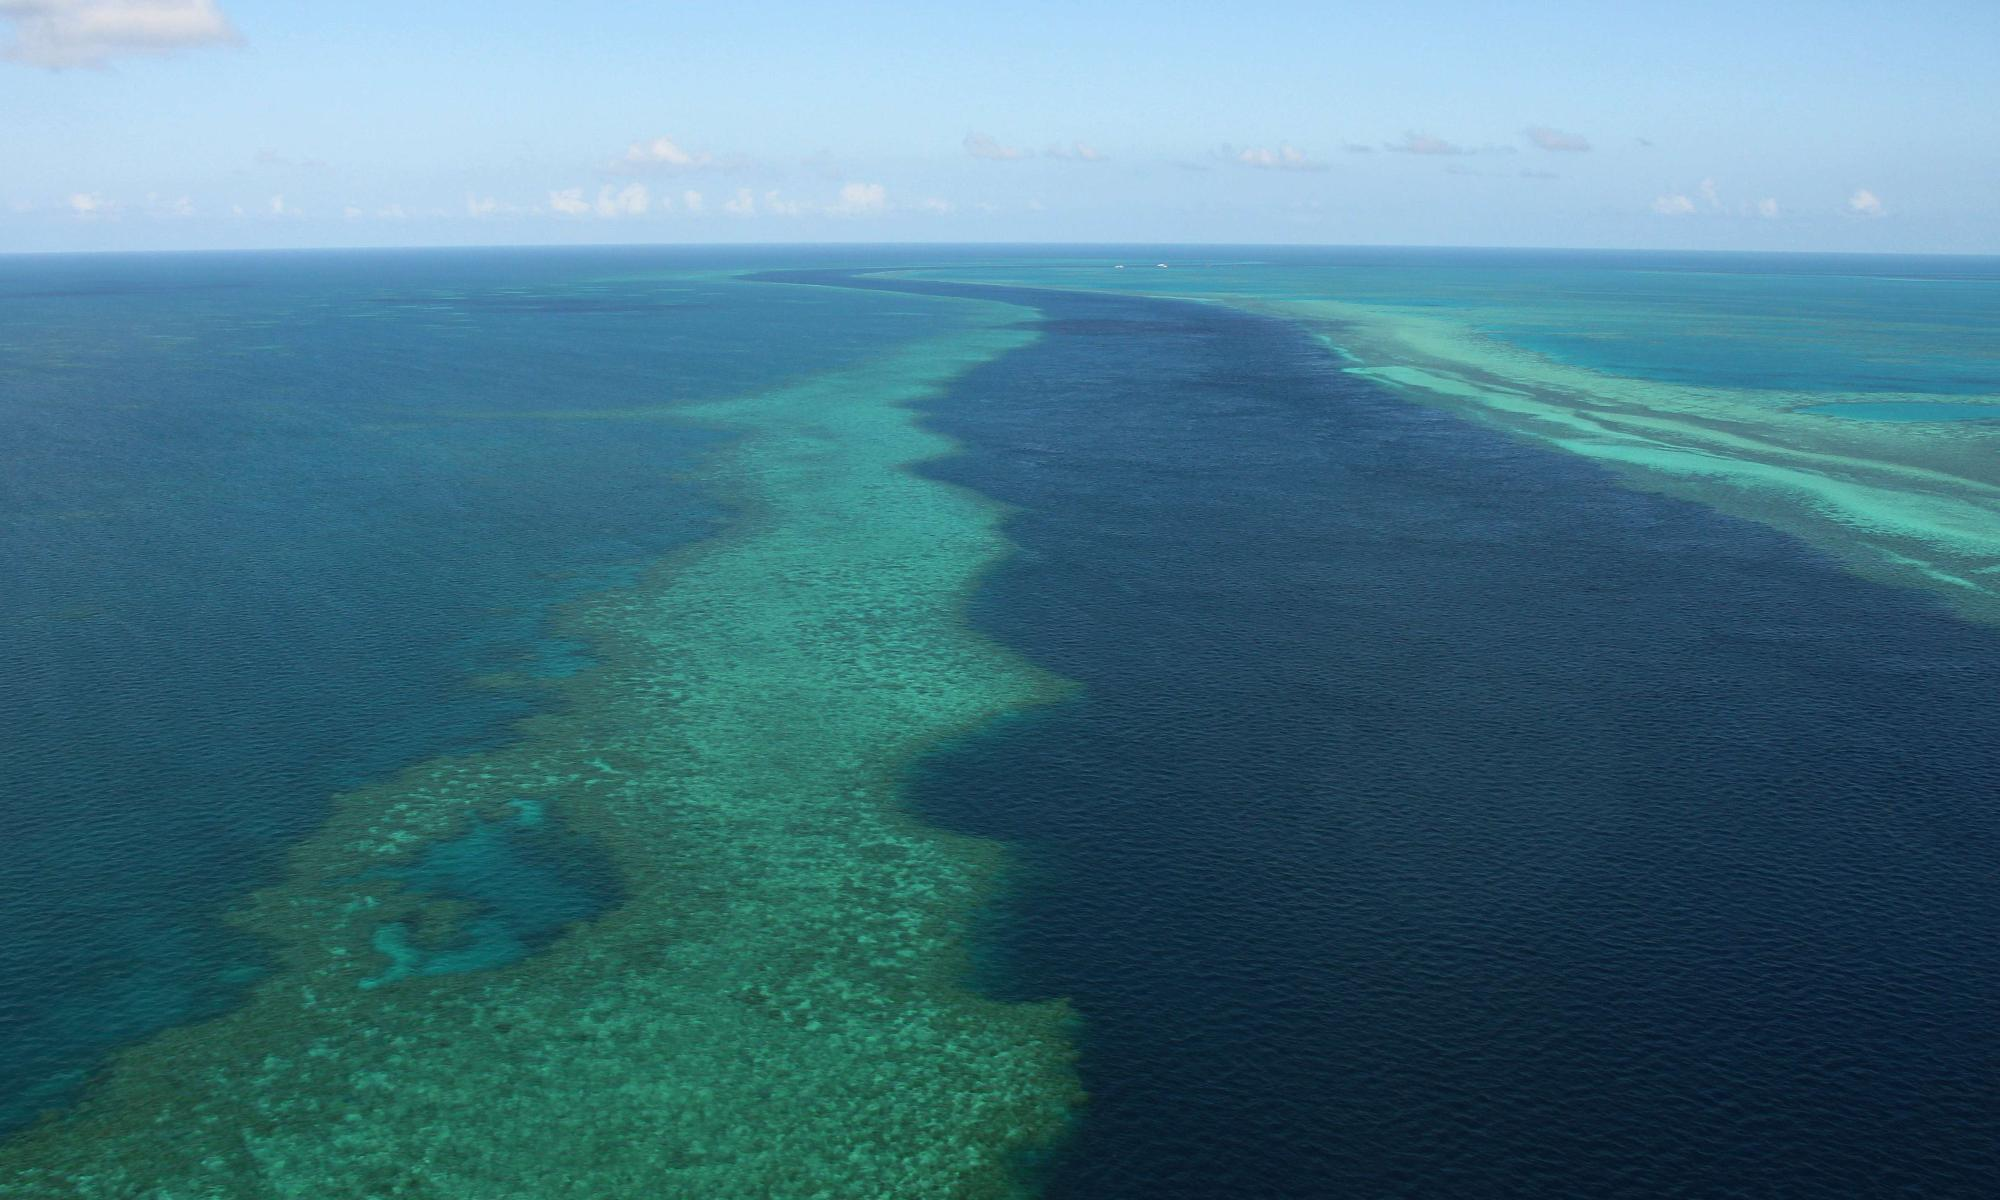 Queensland's proposed Carmichael coalmine faces legal bid over climate change | Environment | The Guardian